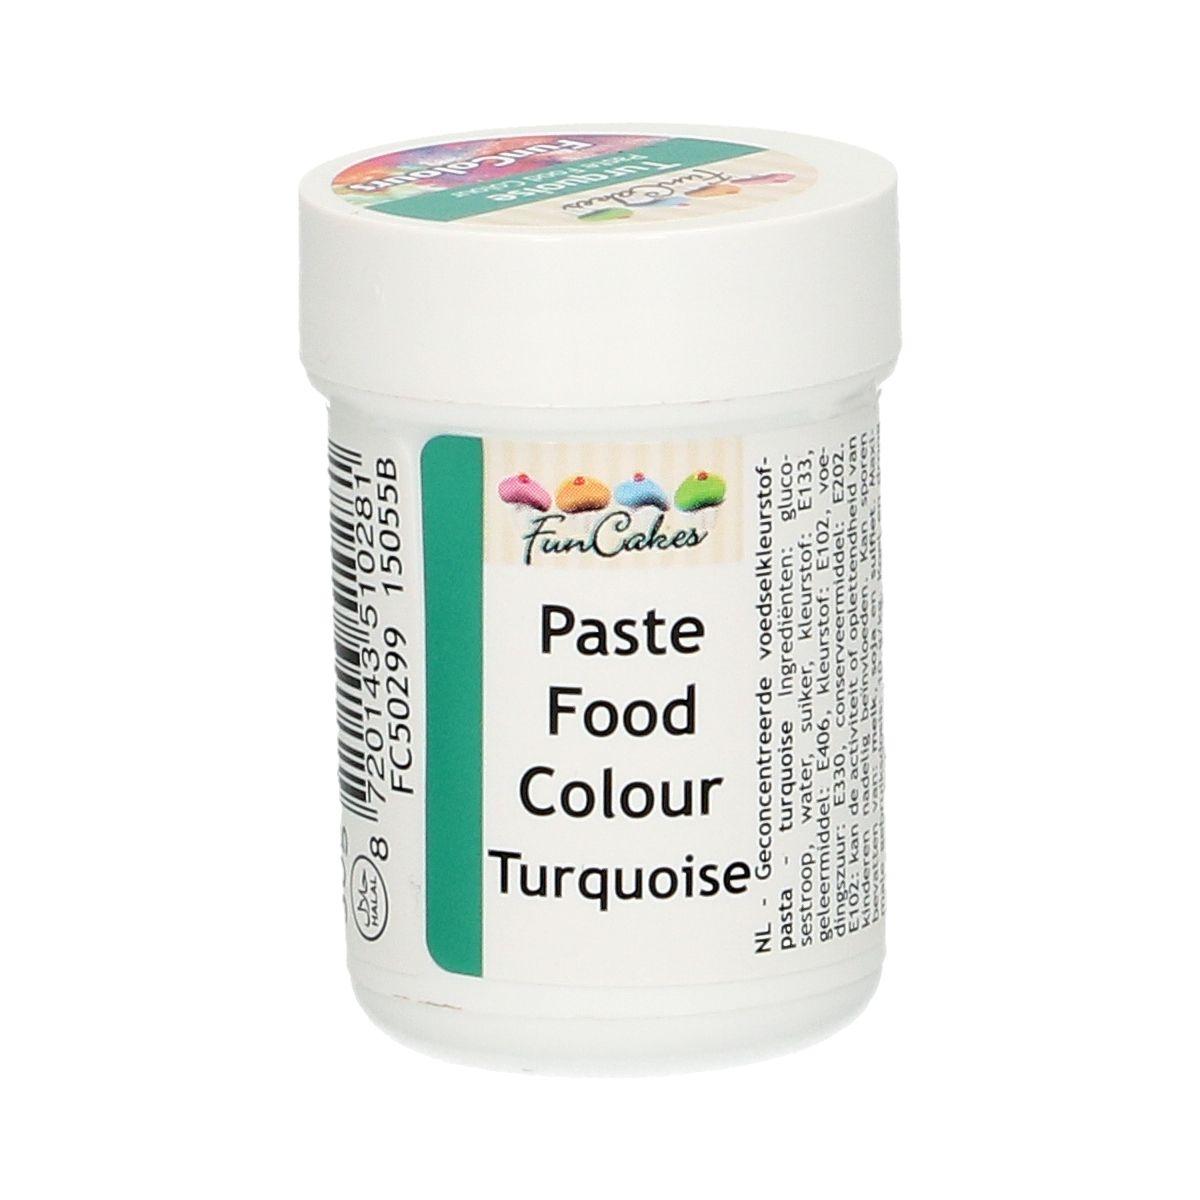 /f/u/funcakes_funcolours_paste_food_colour_turquoise.jpg